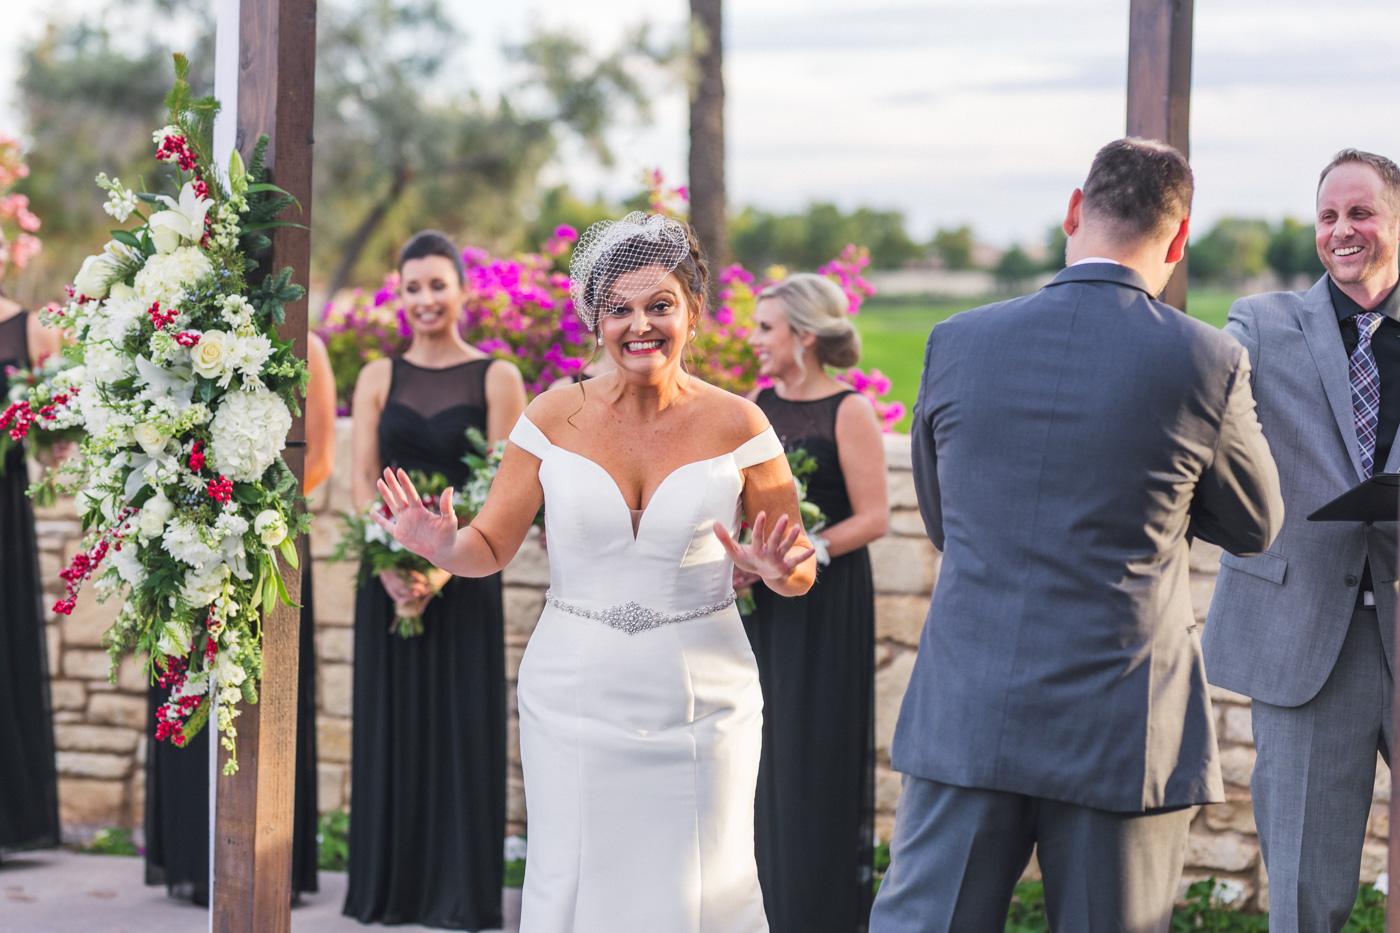 hilarious-bride-at-wedding-ceremony